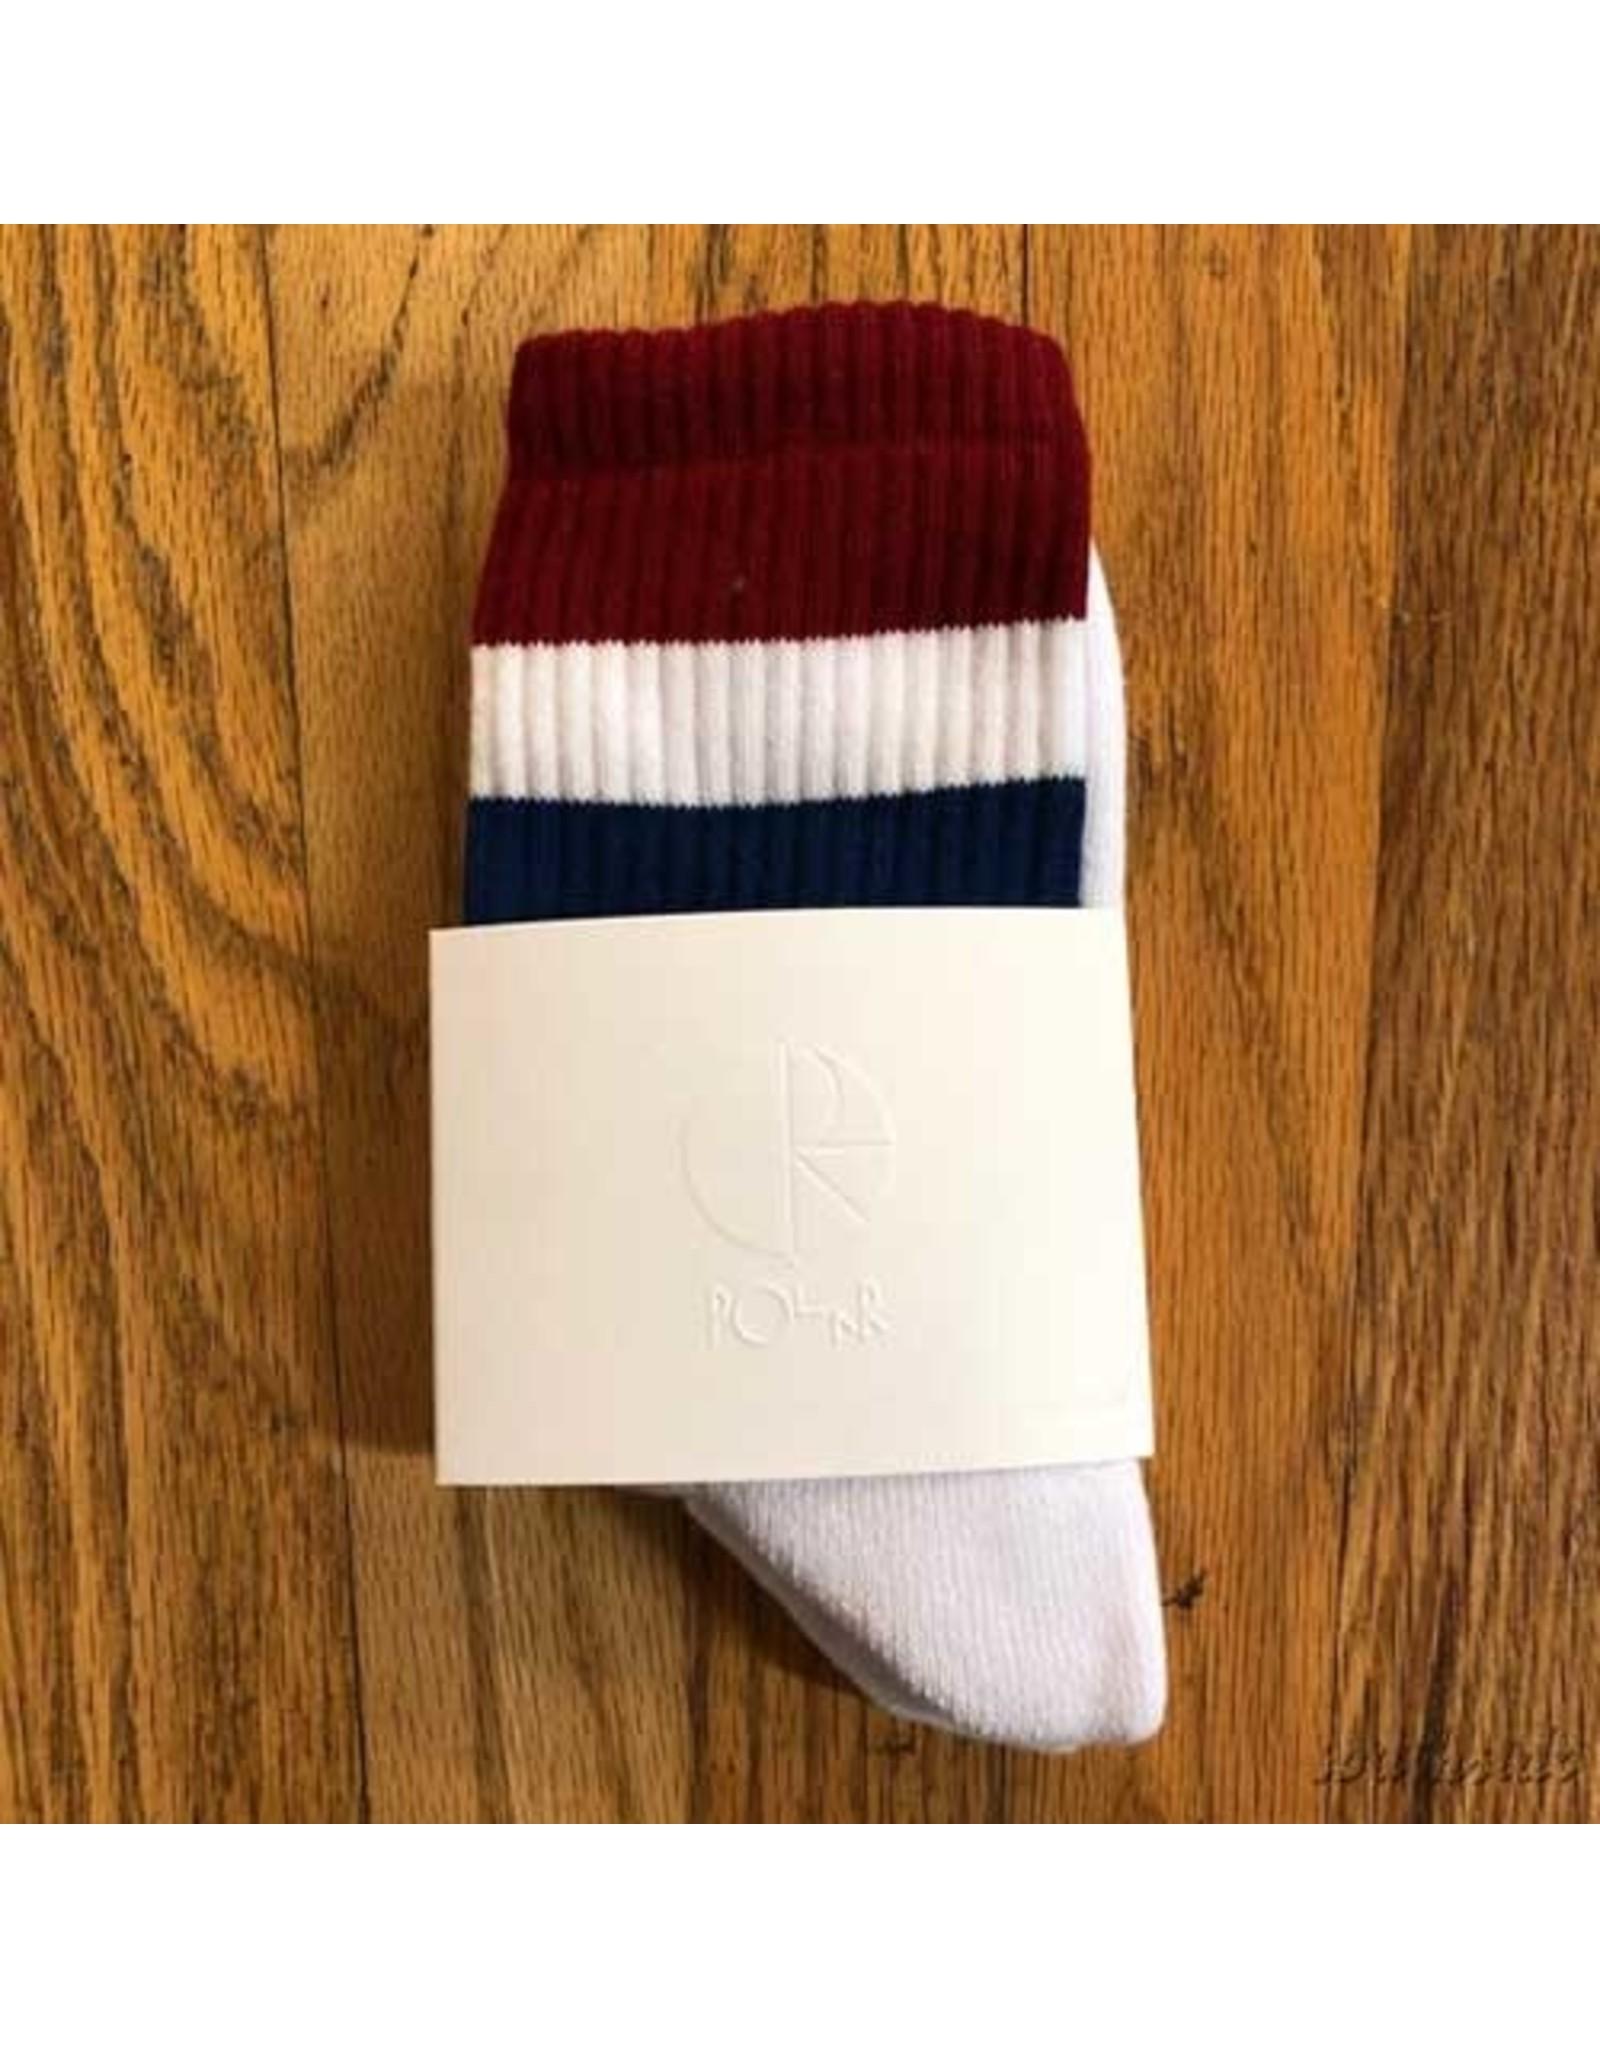 Polar Socks White Burg Navy Stripe Size 6-8